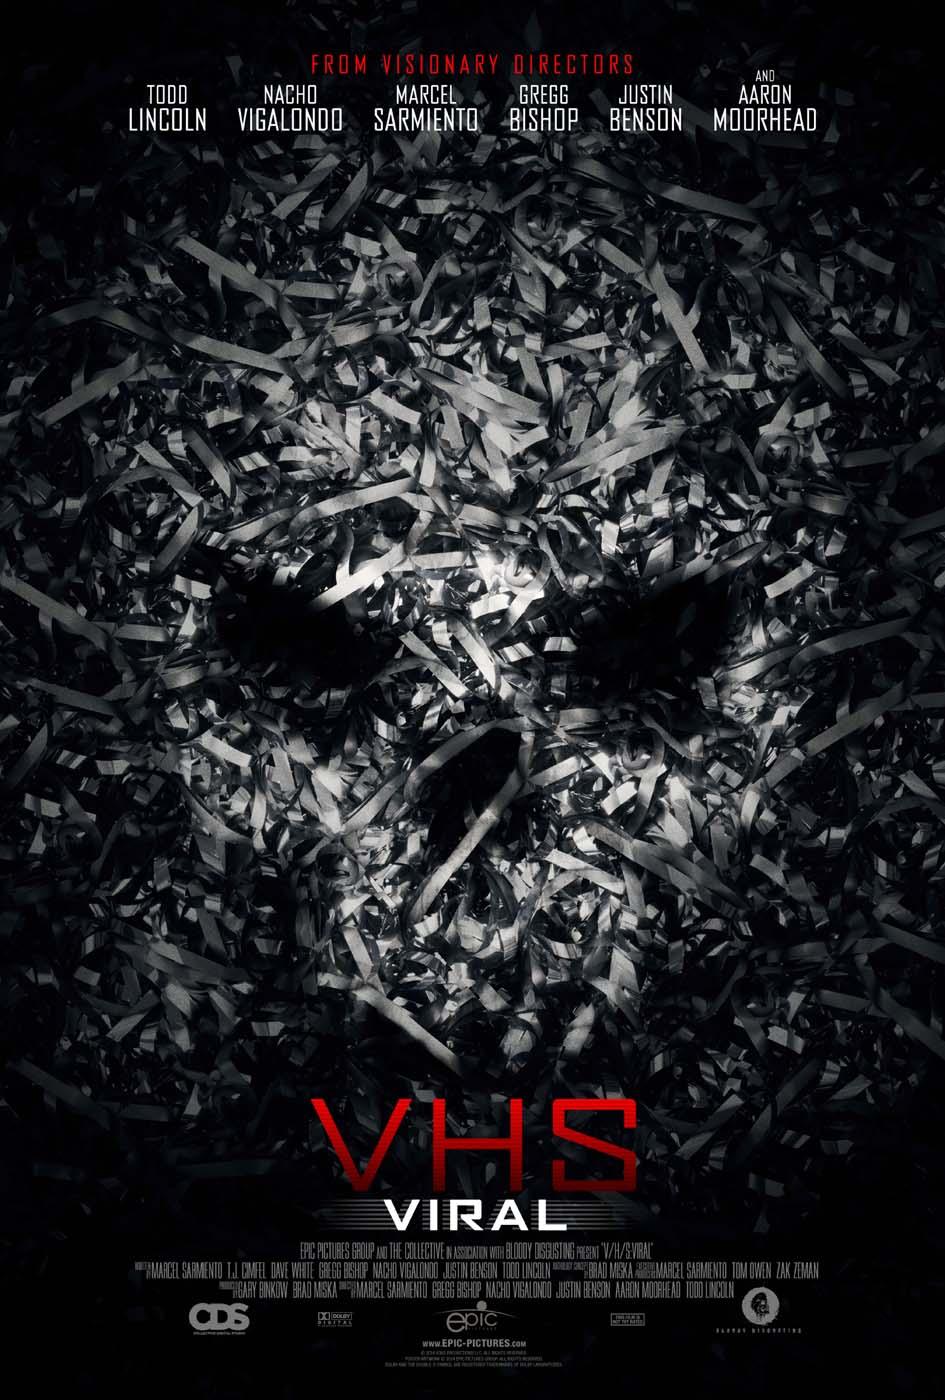 V/H/S Viral VHS Viral Poster